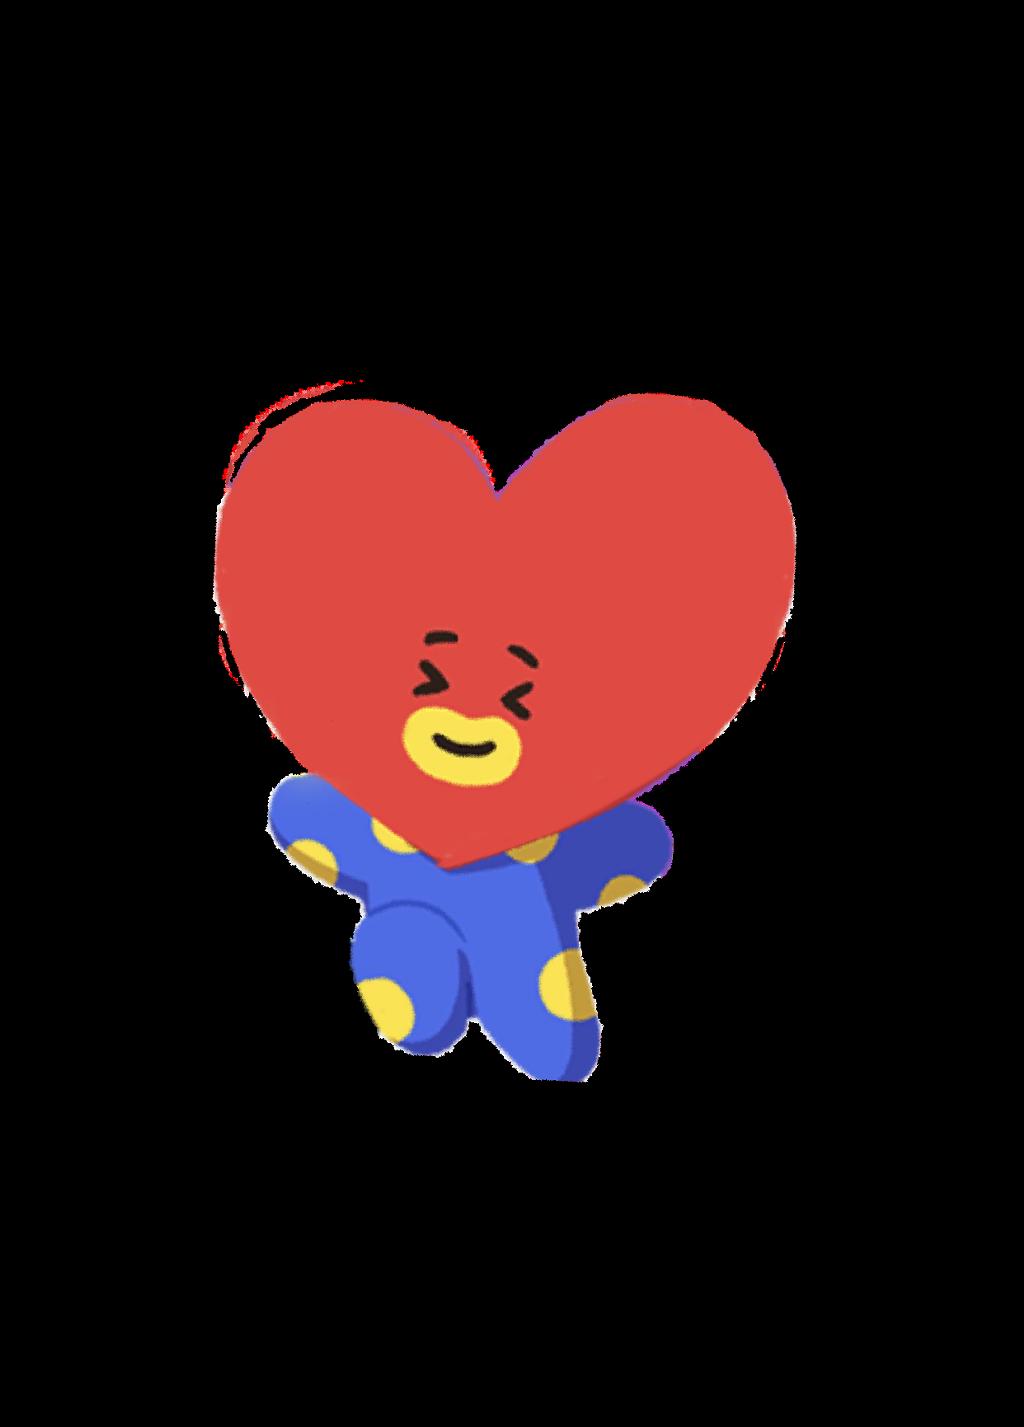 transparent cartoon heart 23